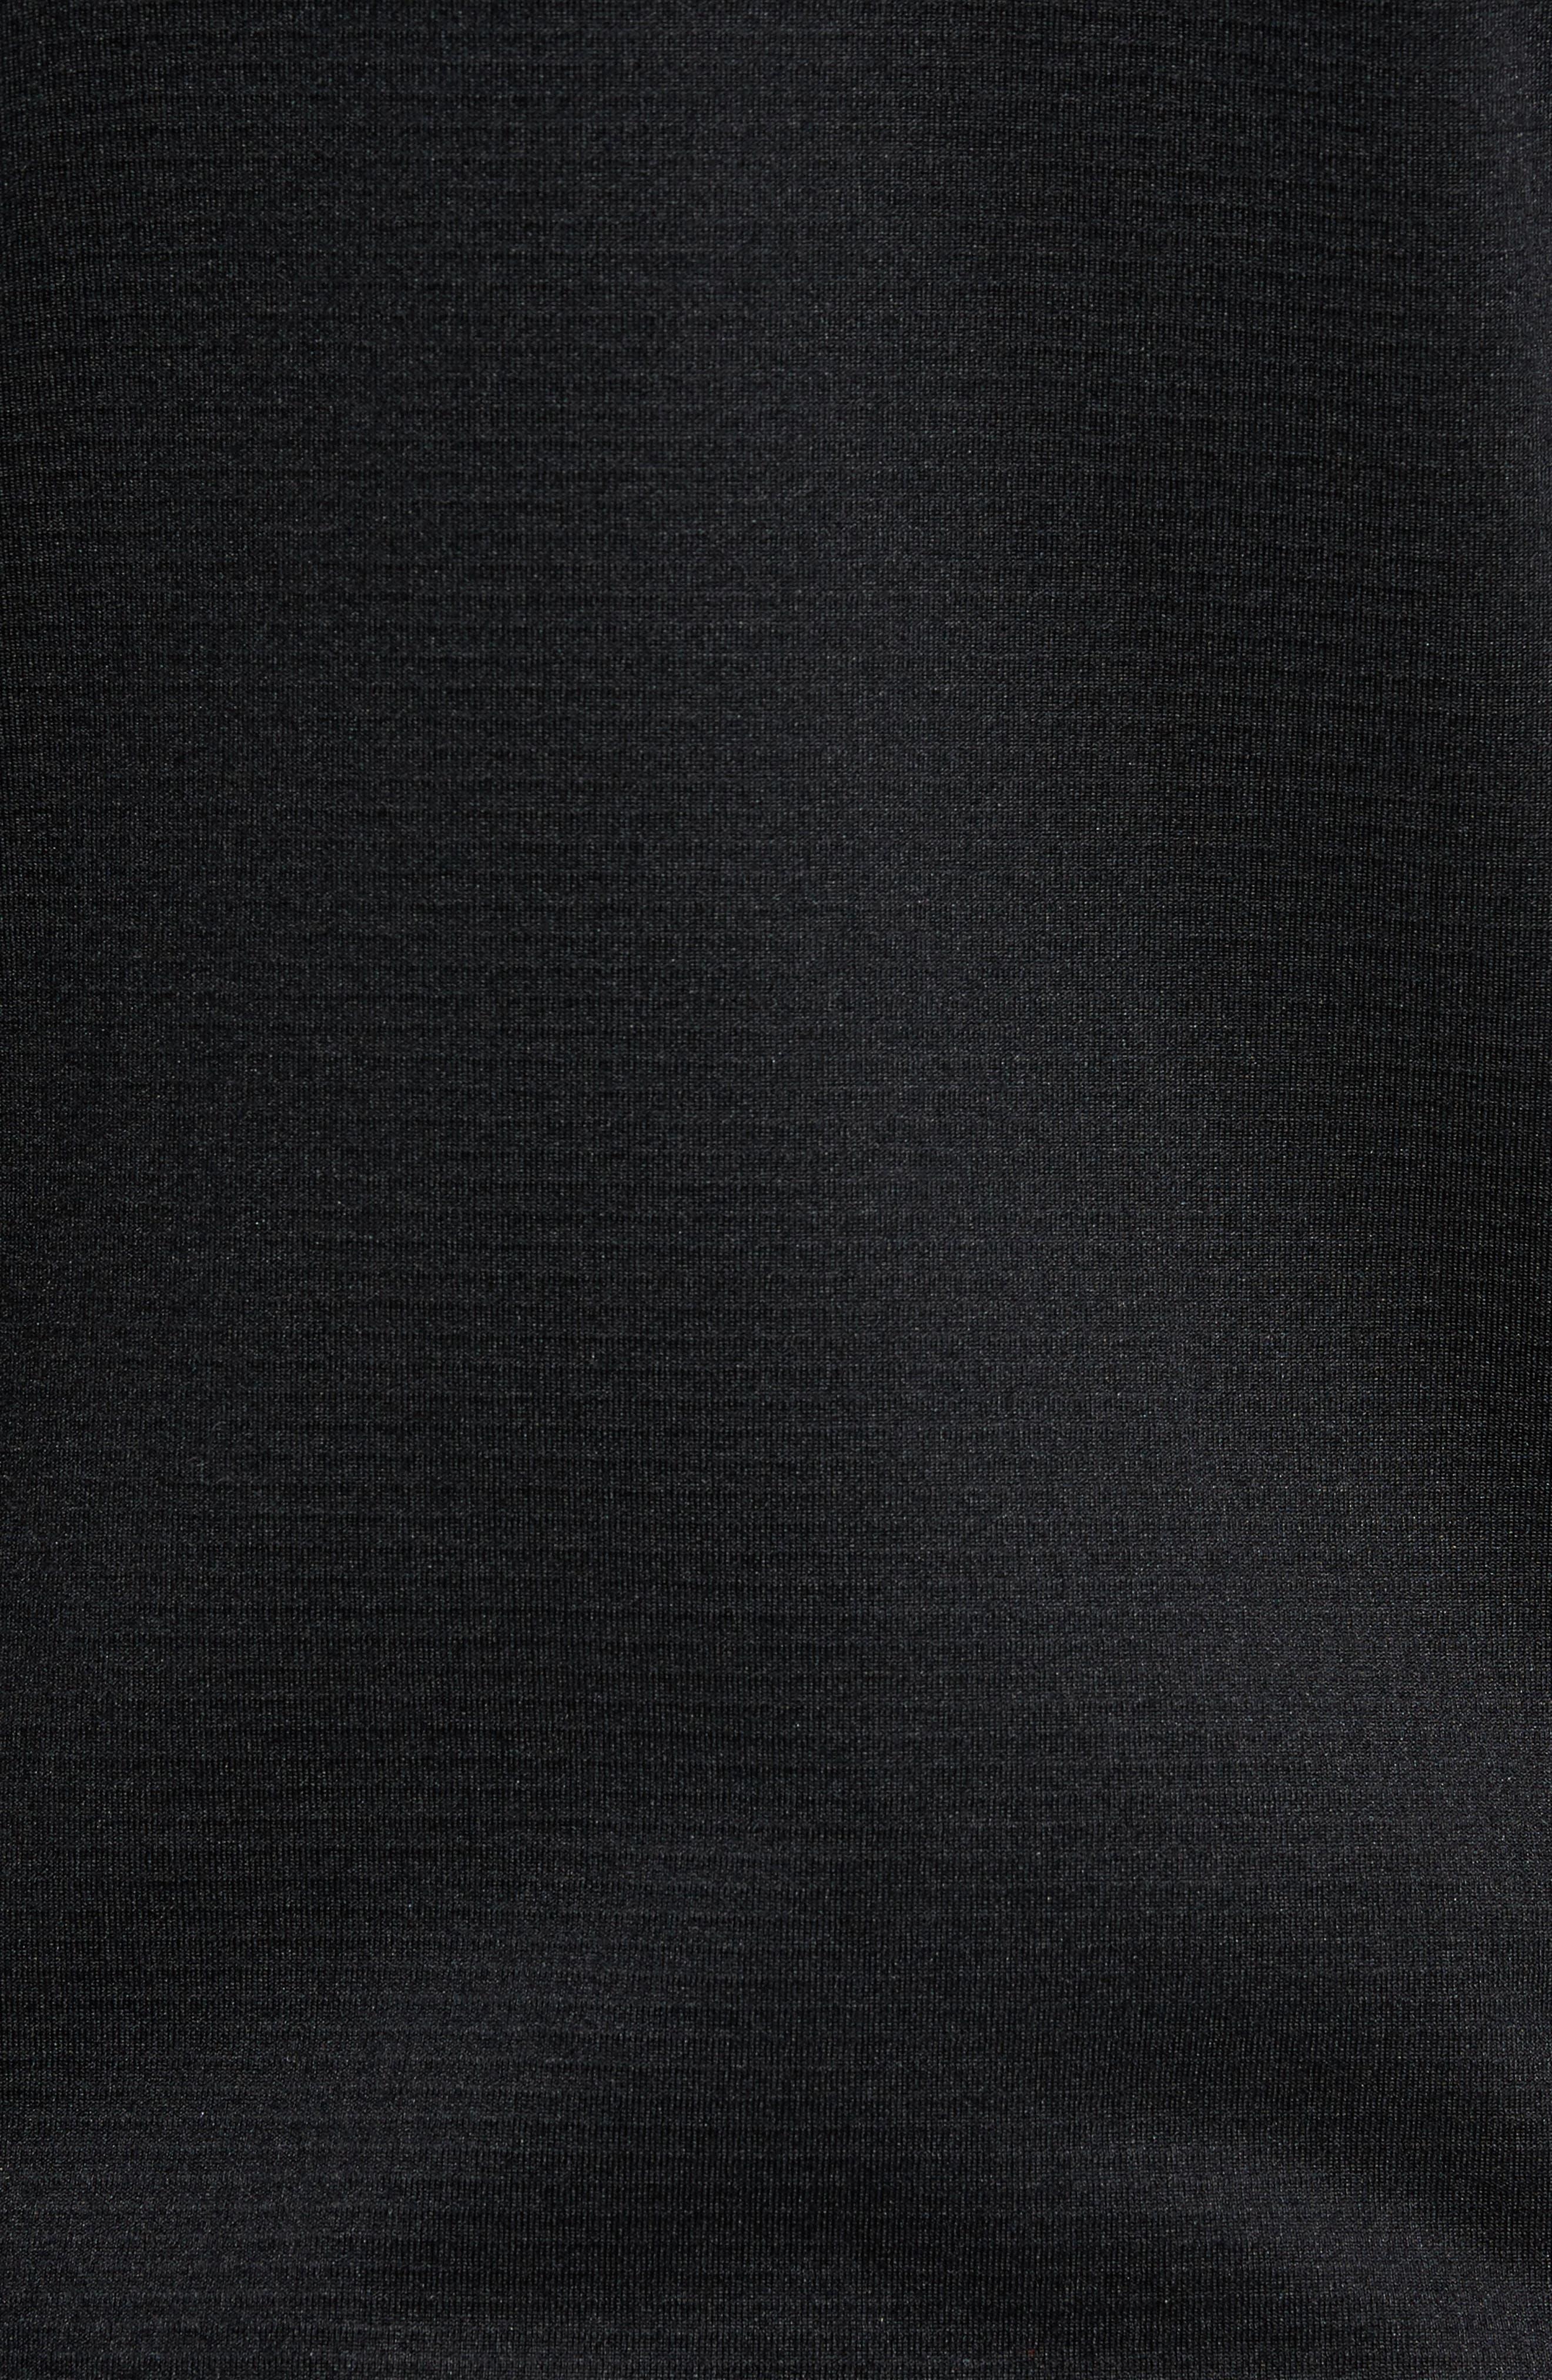 Borod Zip Fleece Jacket,                             Alternate thumbnail 6, color,                             BLACK/ BLACK